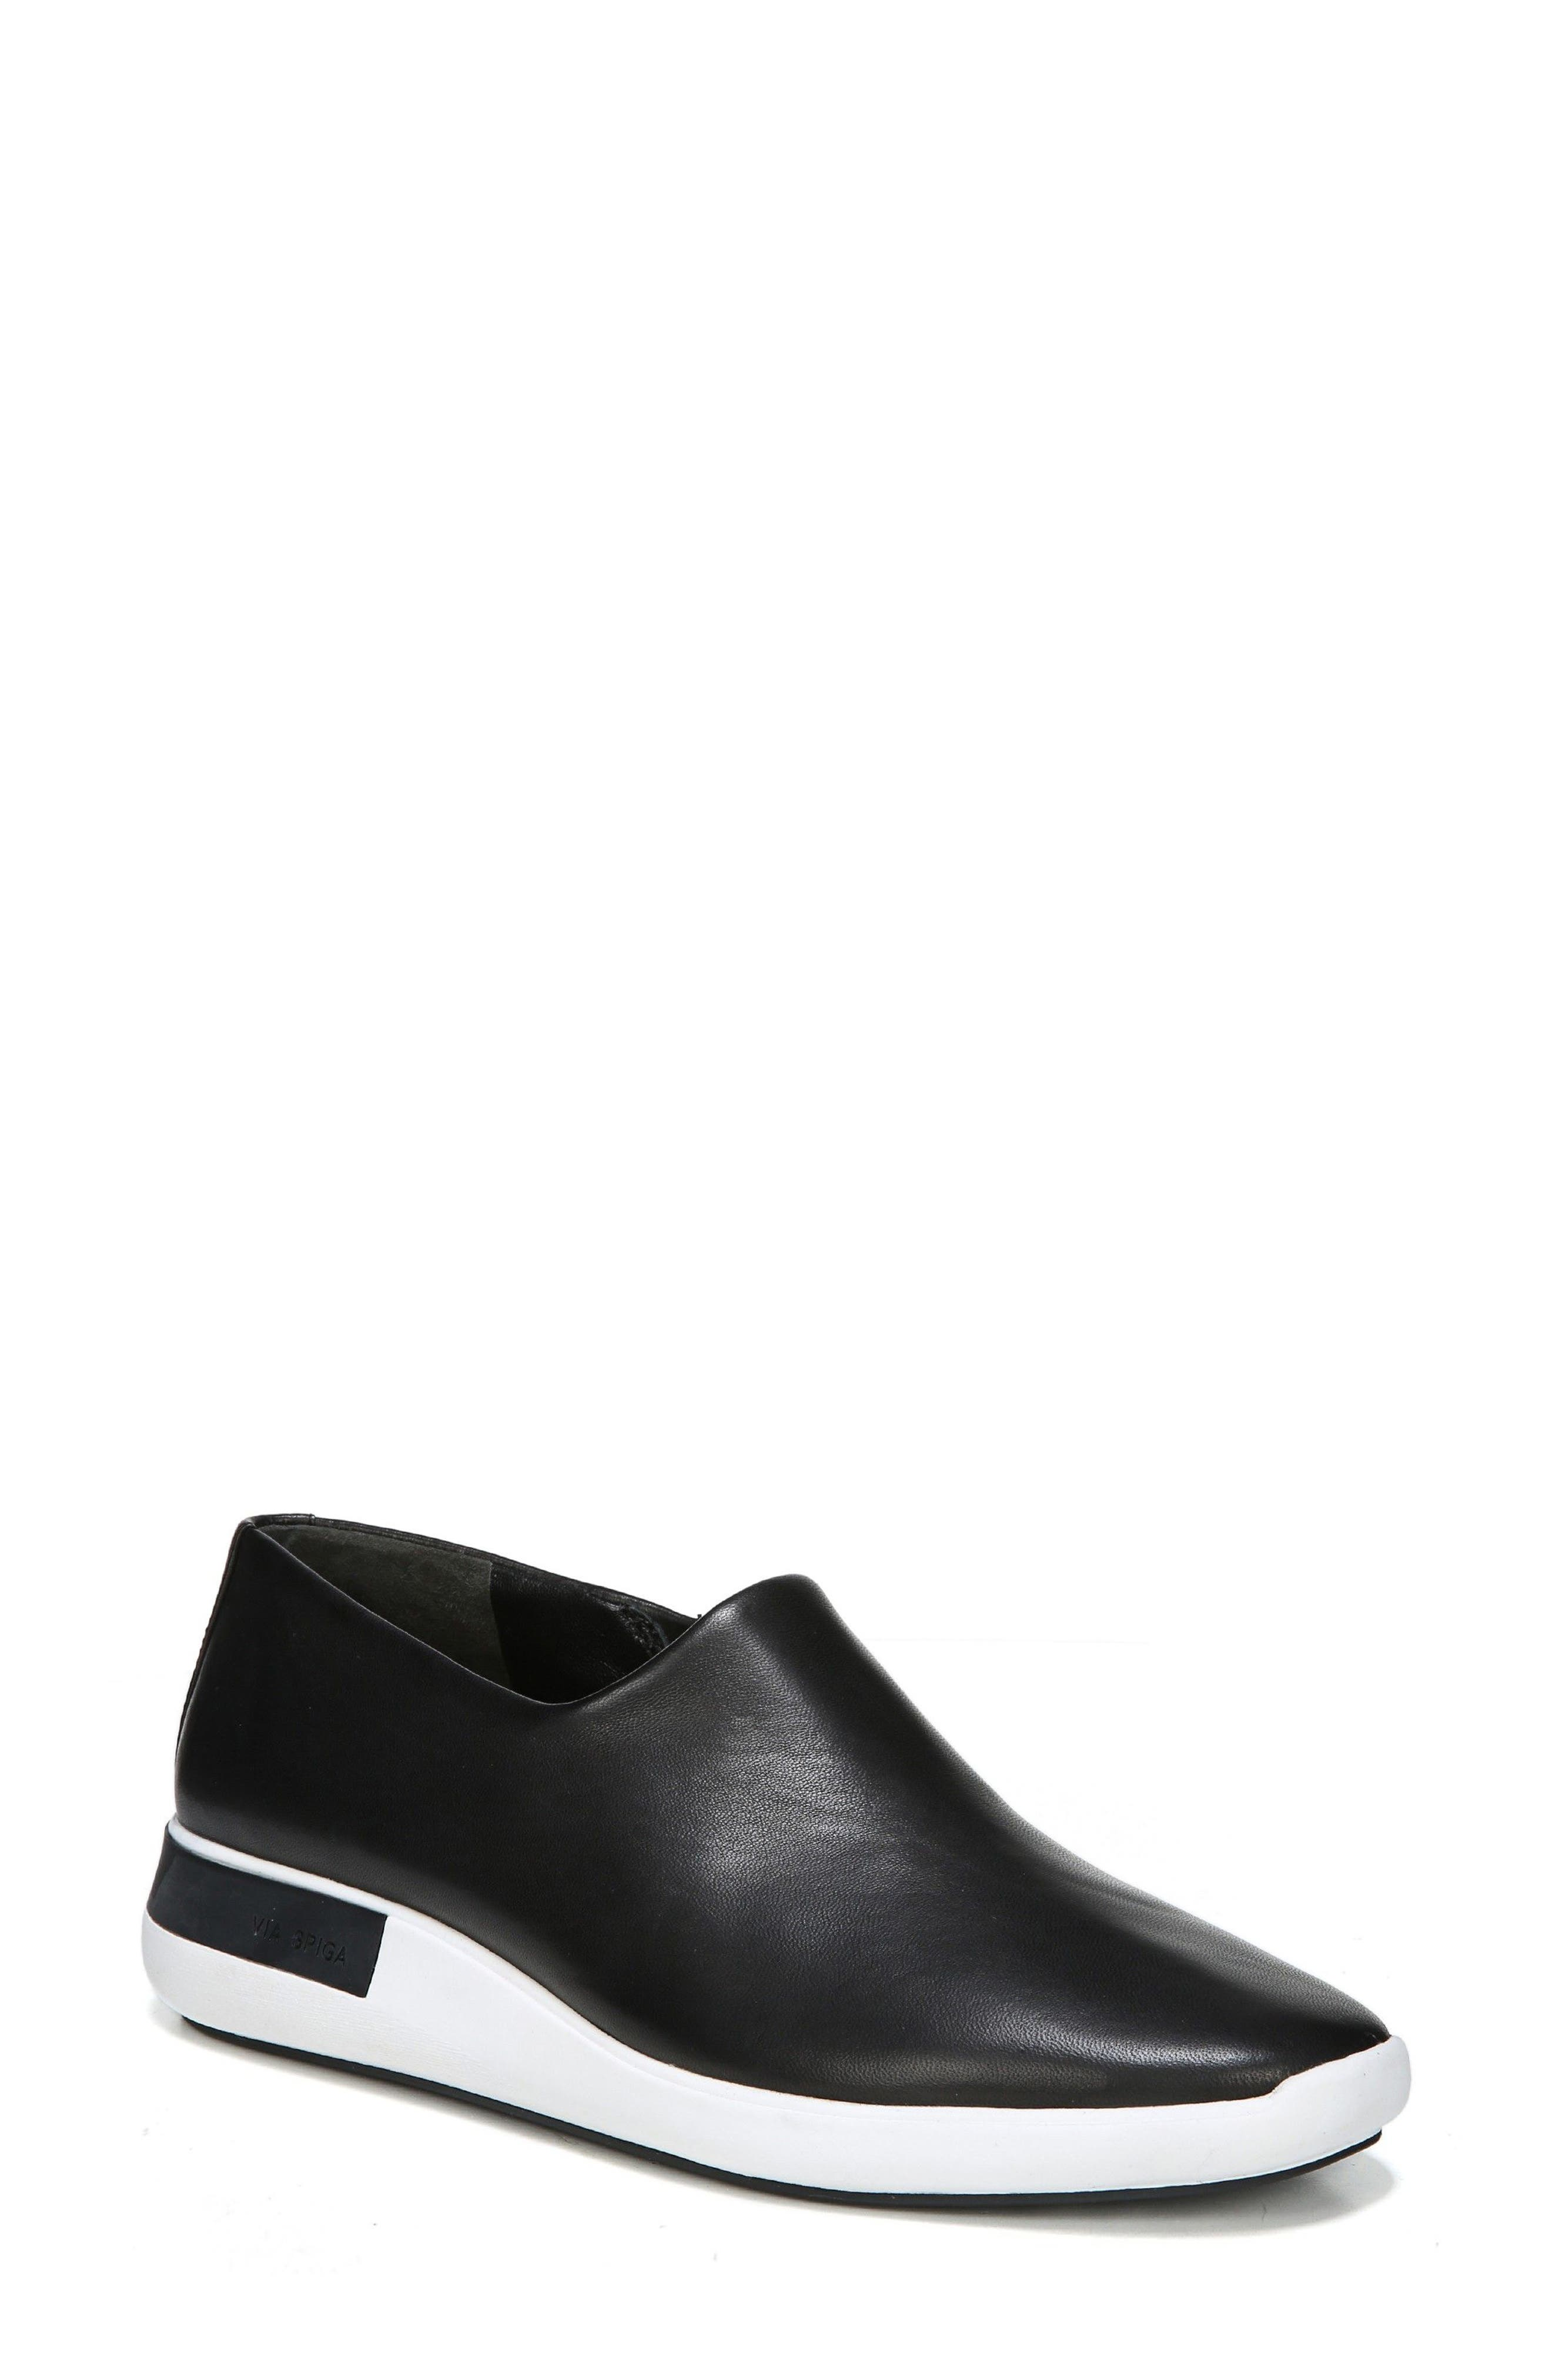 Malena Slip-On Sneaker,                         Main,                         color, 001